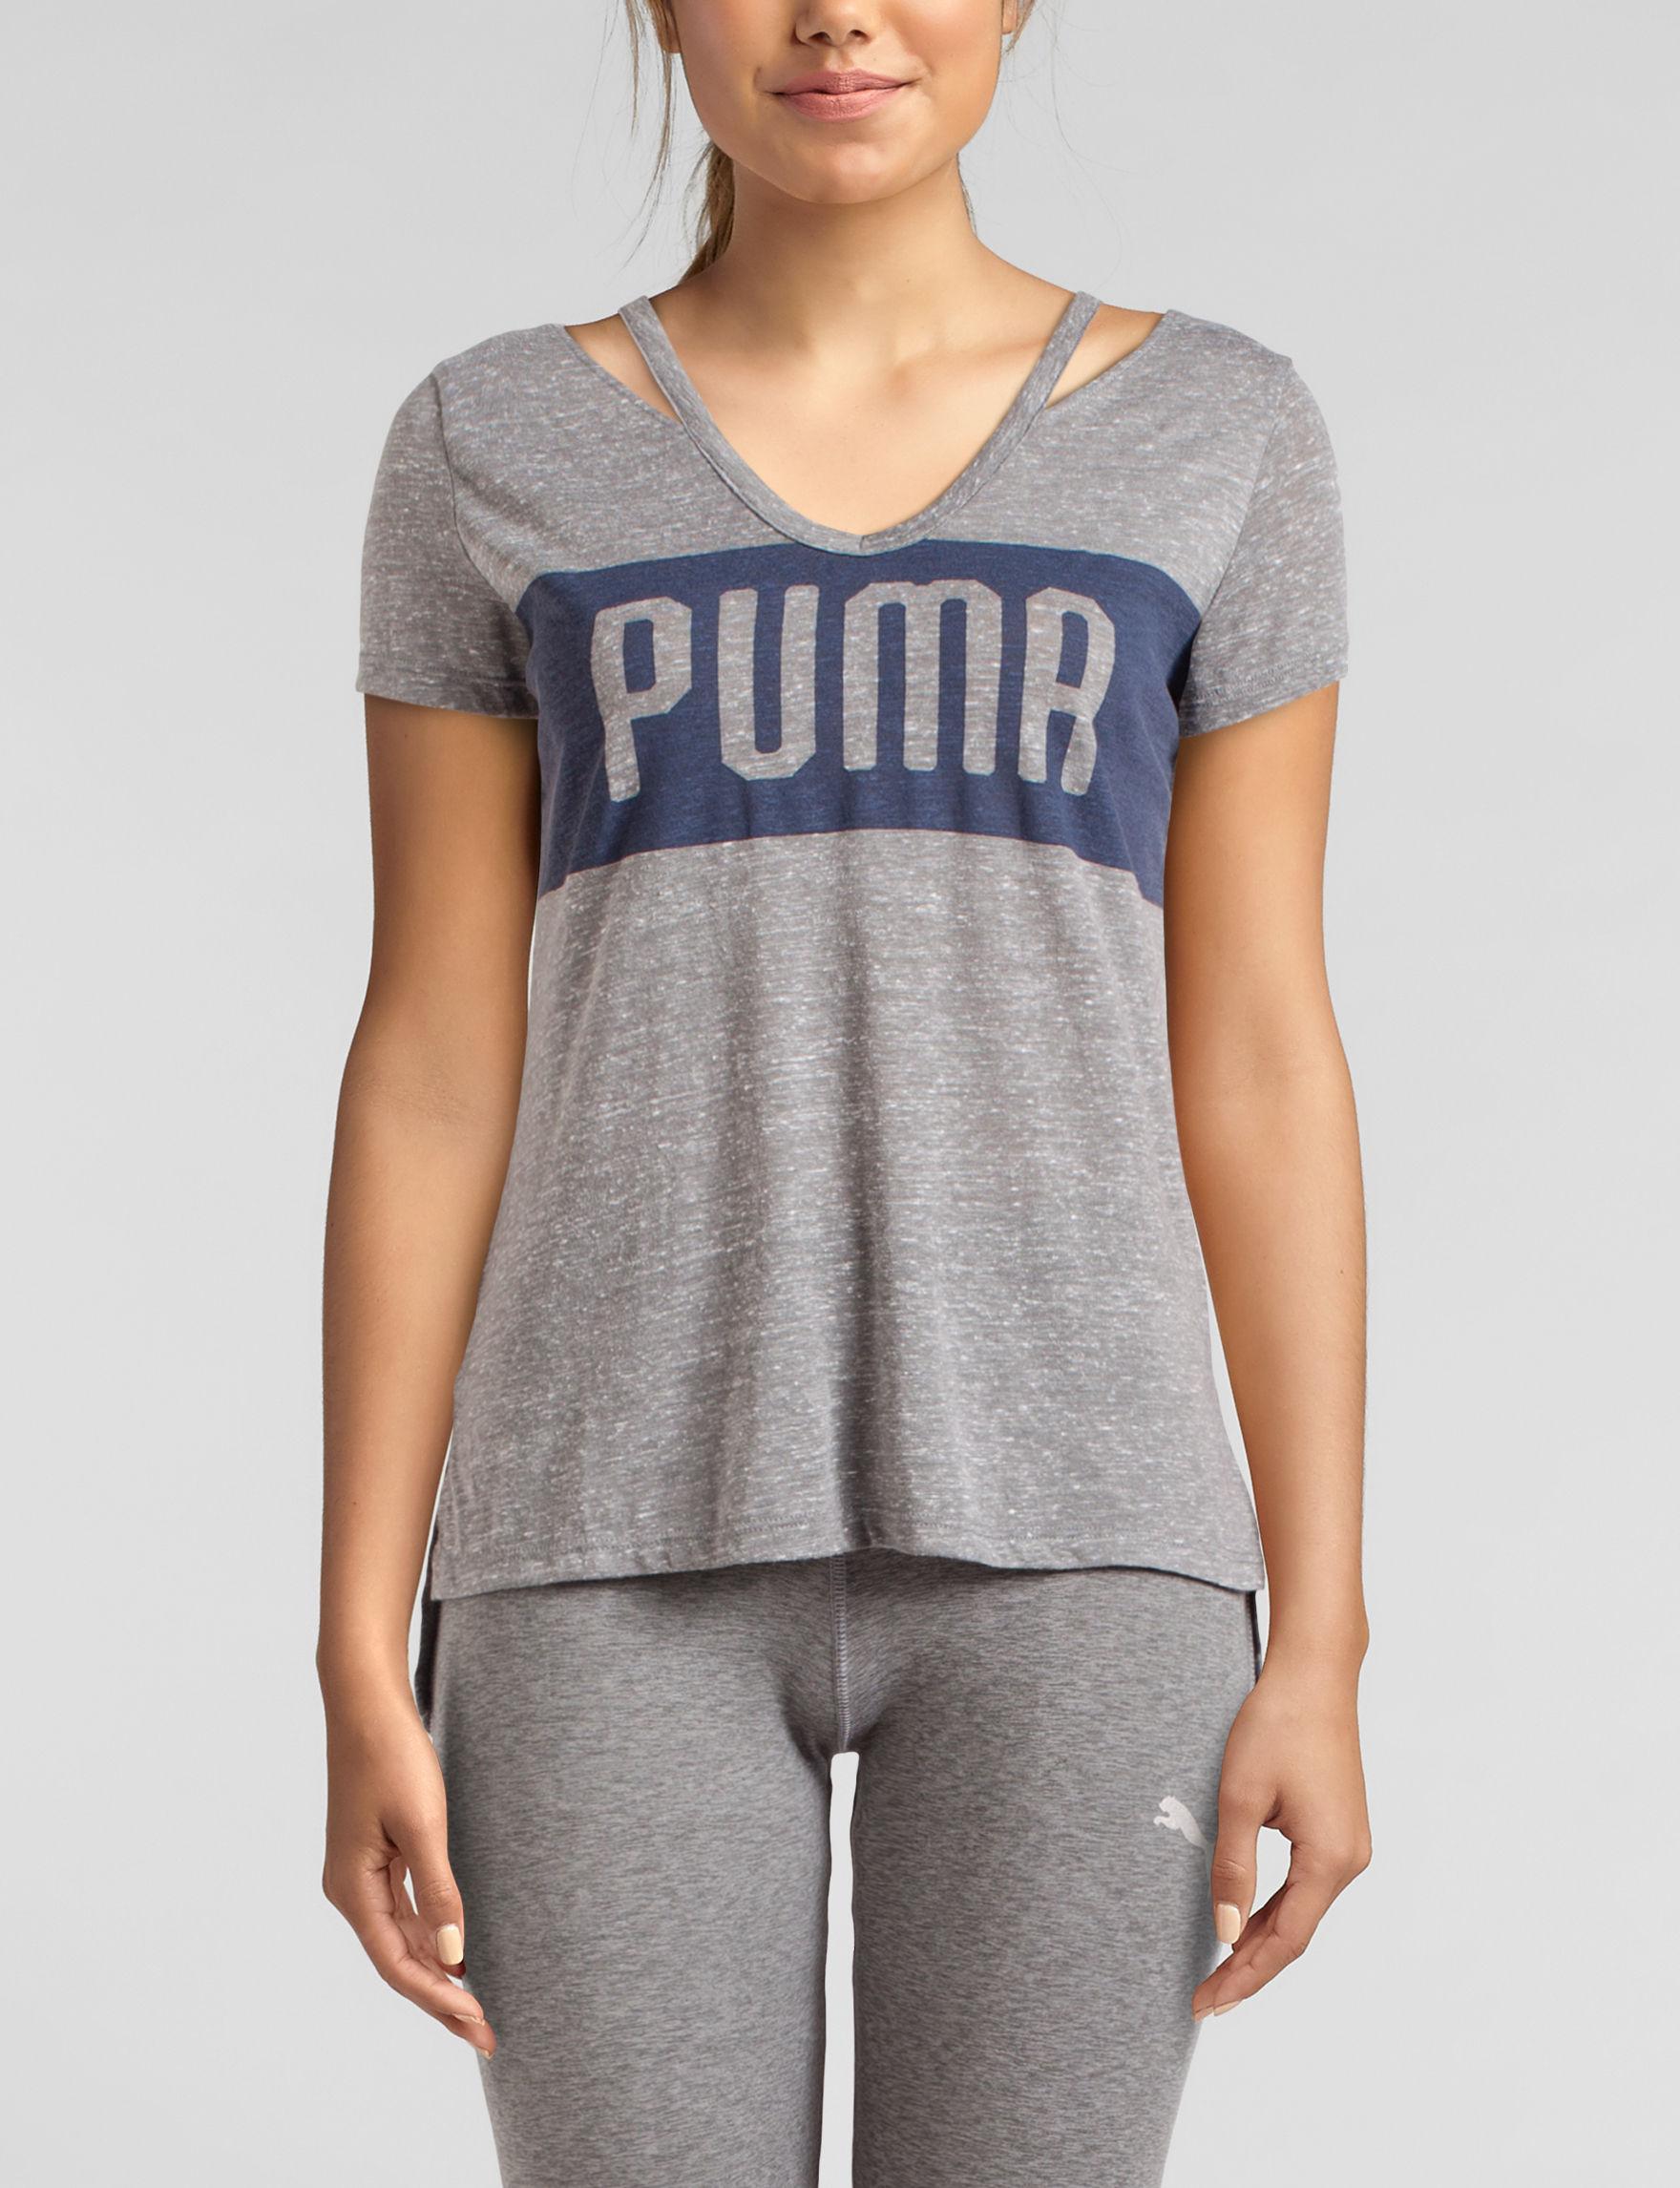 Puma Grey Tees & Tanks